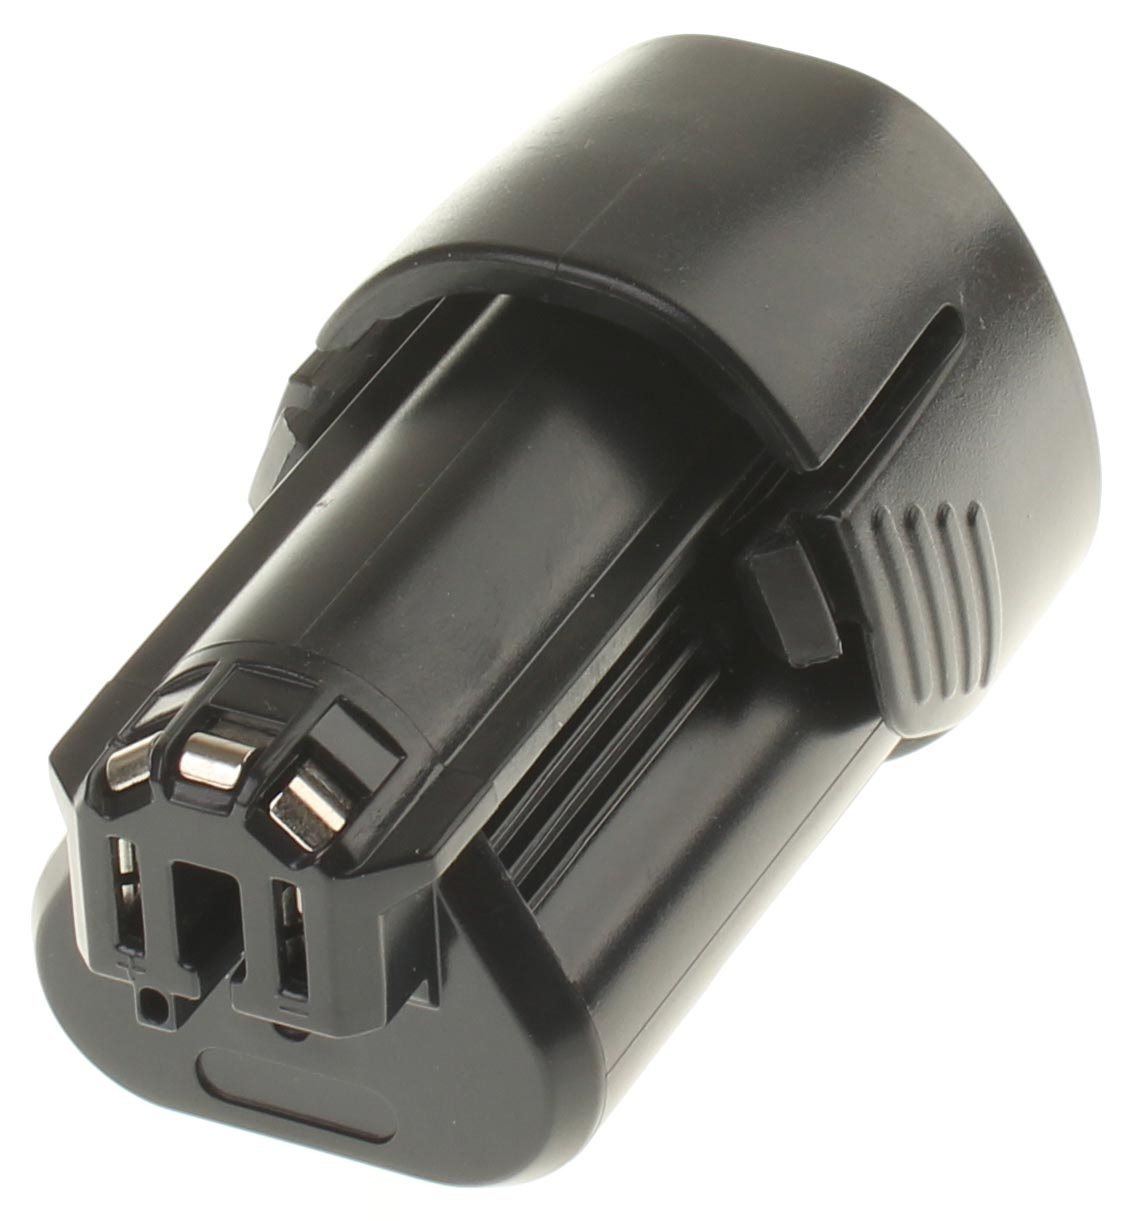 Аккумуляторная батарея D-70745 для электроинструмента Bosch. Артикул iB-T182.Емкость (mAh): 1500. Напряжение (V): 10,8